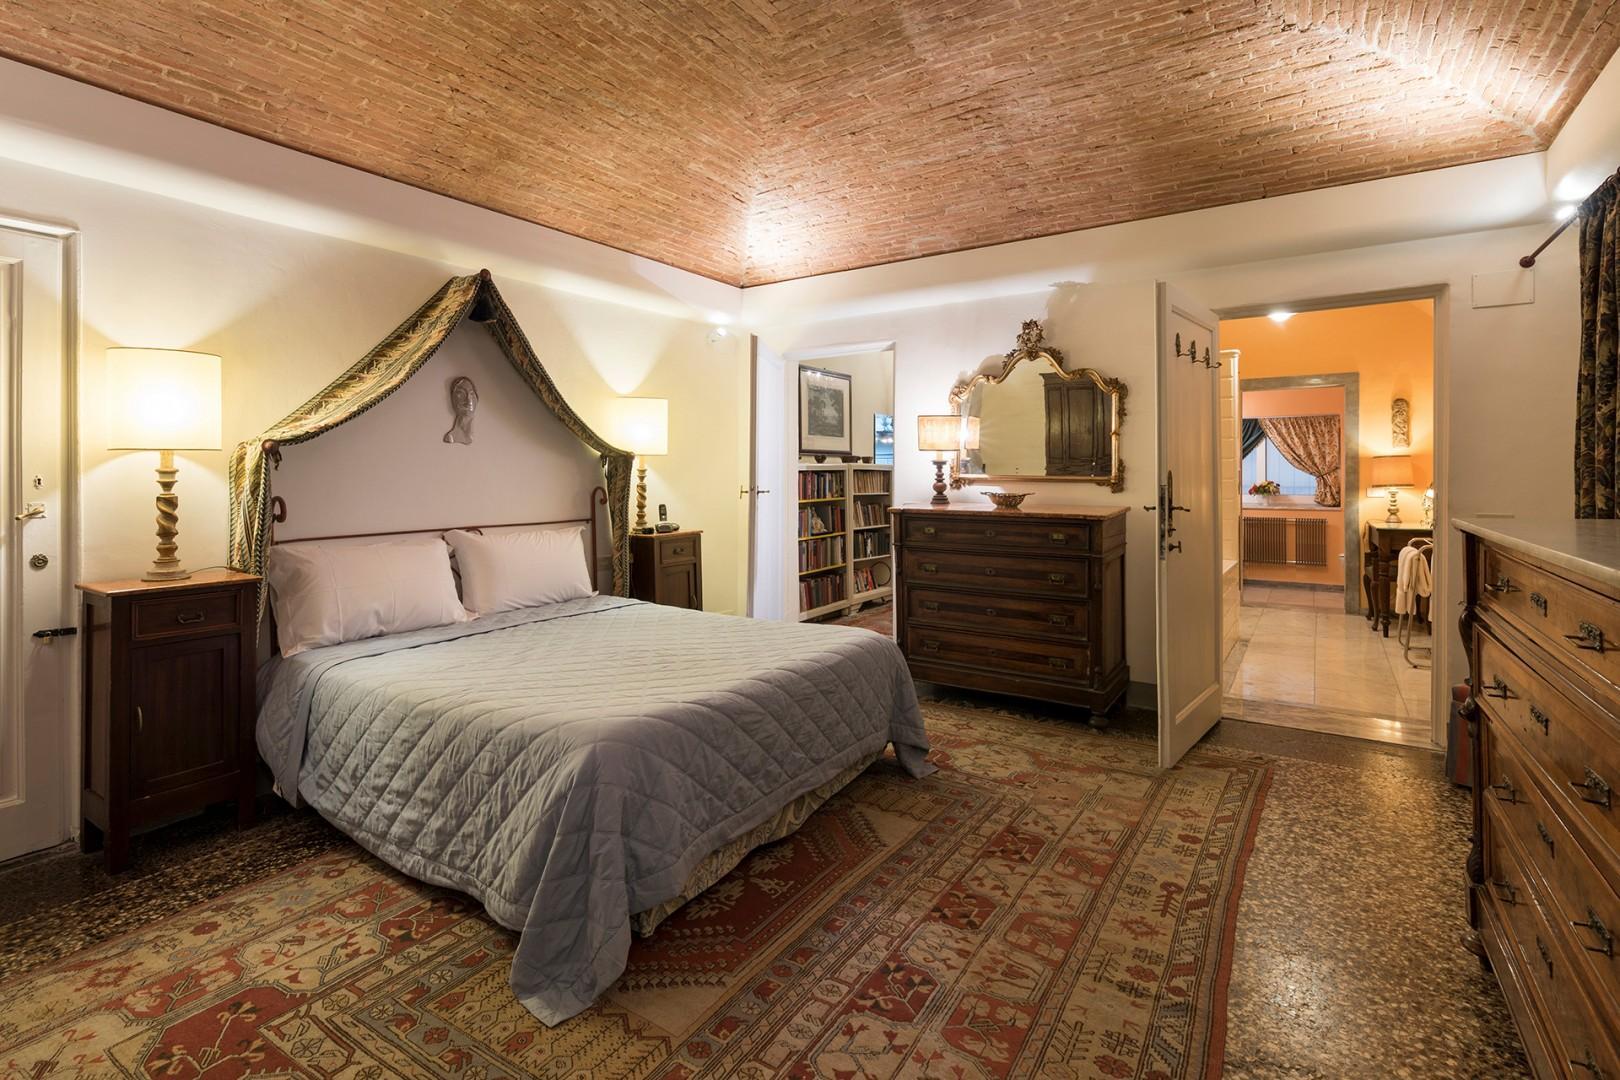 Large bedroom 1 has plenty of storage and an en suite bathroom.